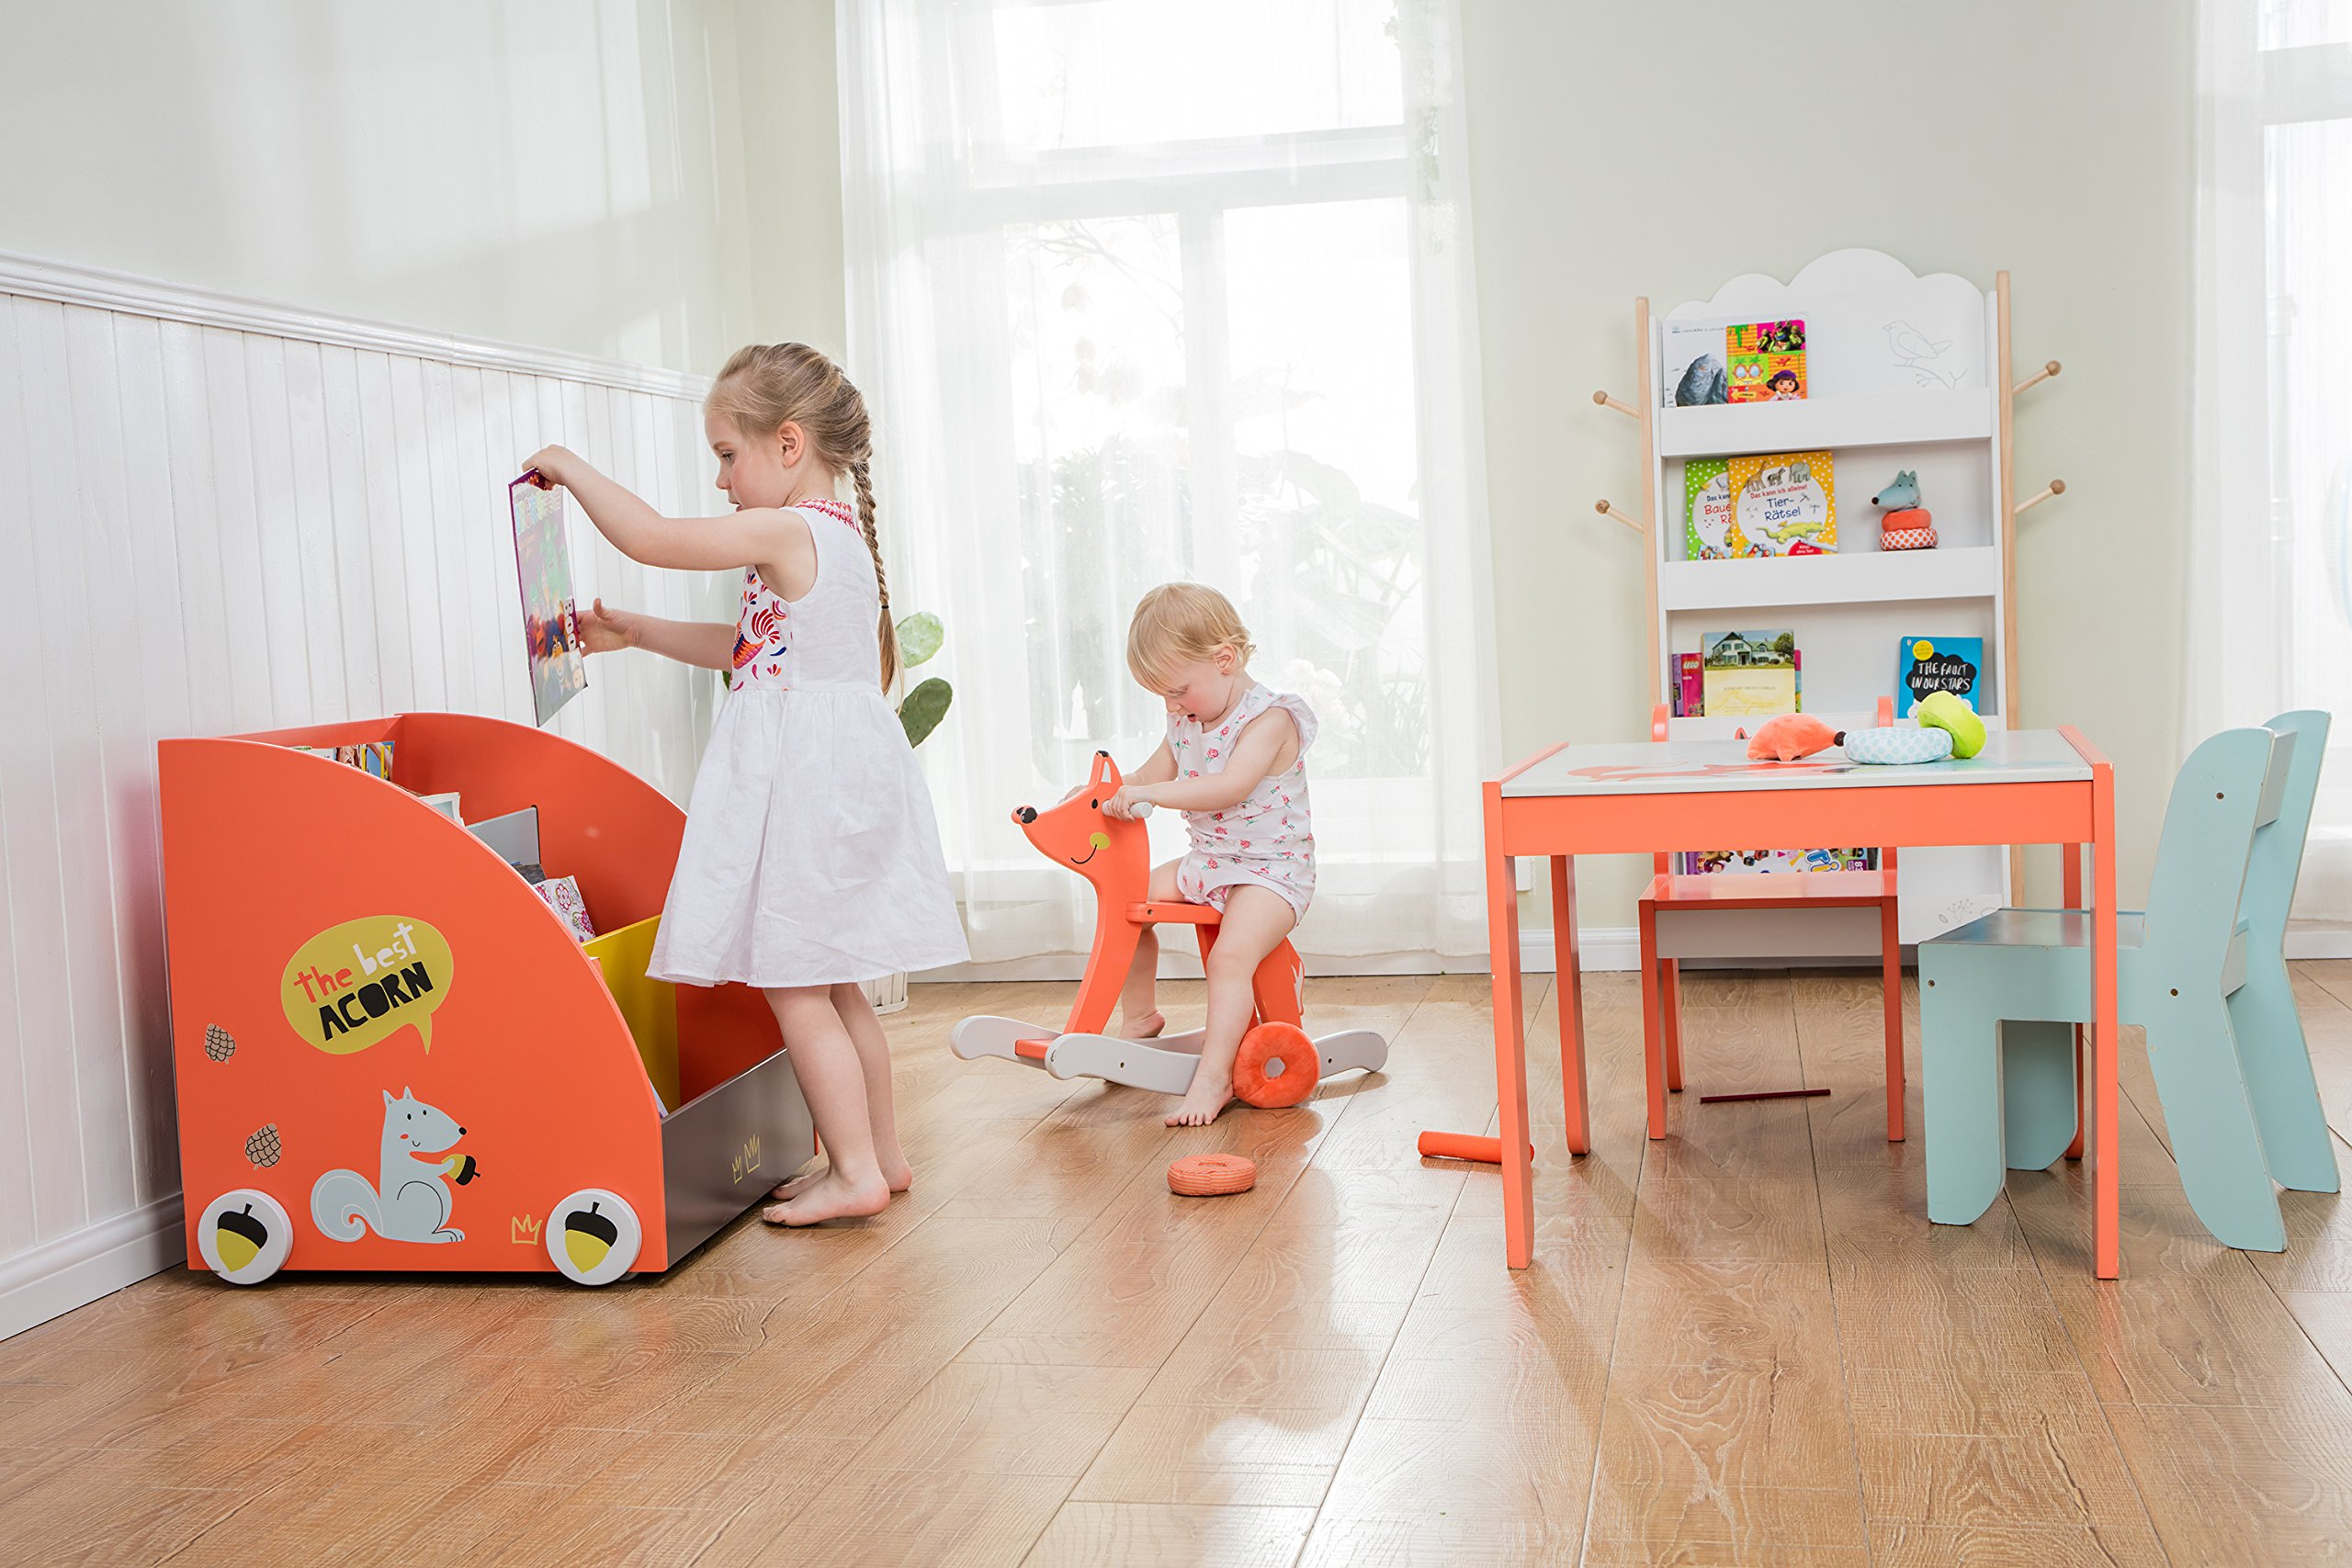 Labebe Kid Bookshelf With Wheels Orange Pine Wood For 1 Year UpBaby Child Toddler Book Rack